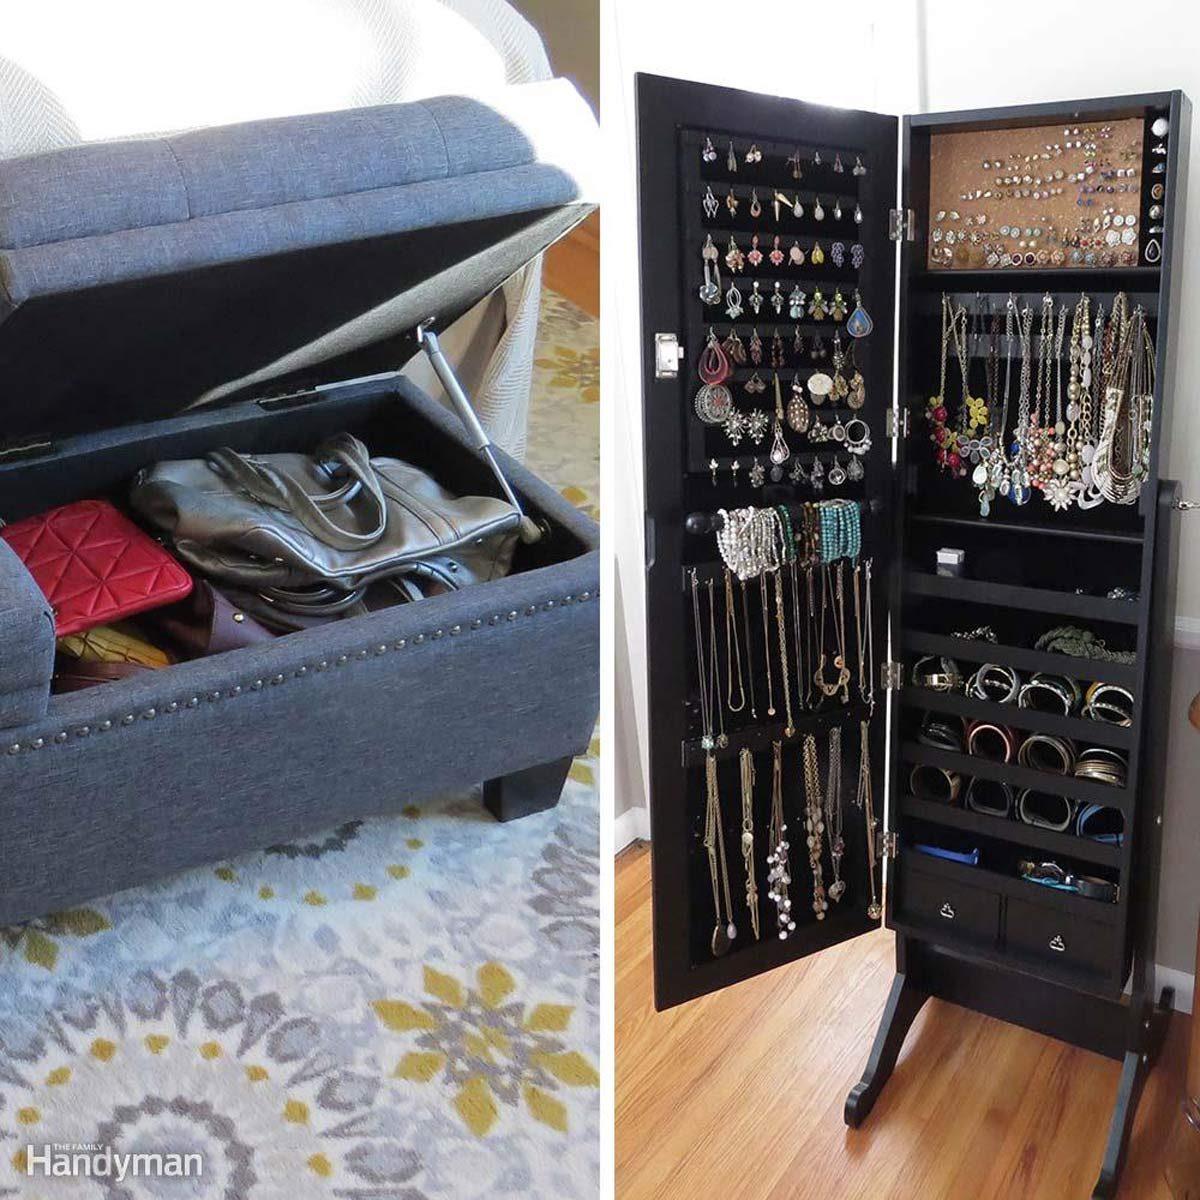 Closet Storage Ideas: Double-Duty Furniture and Storage